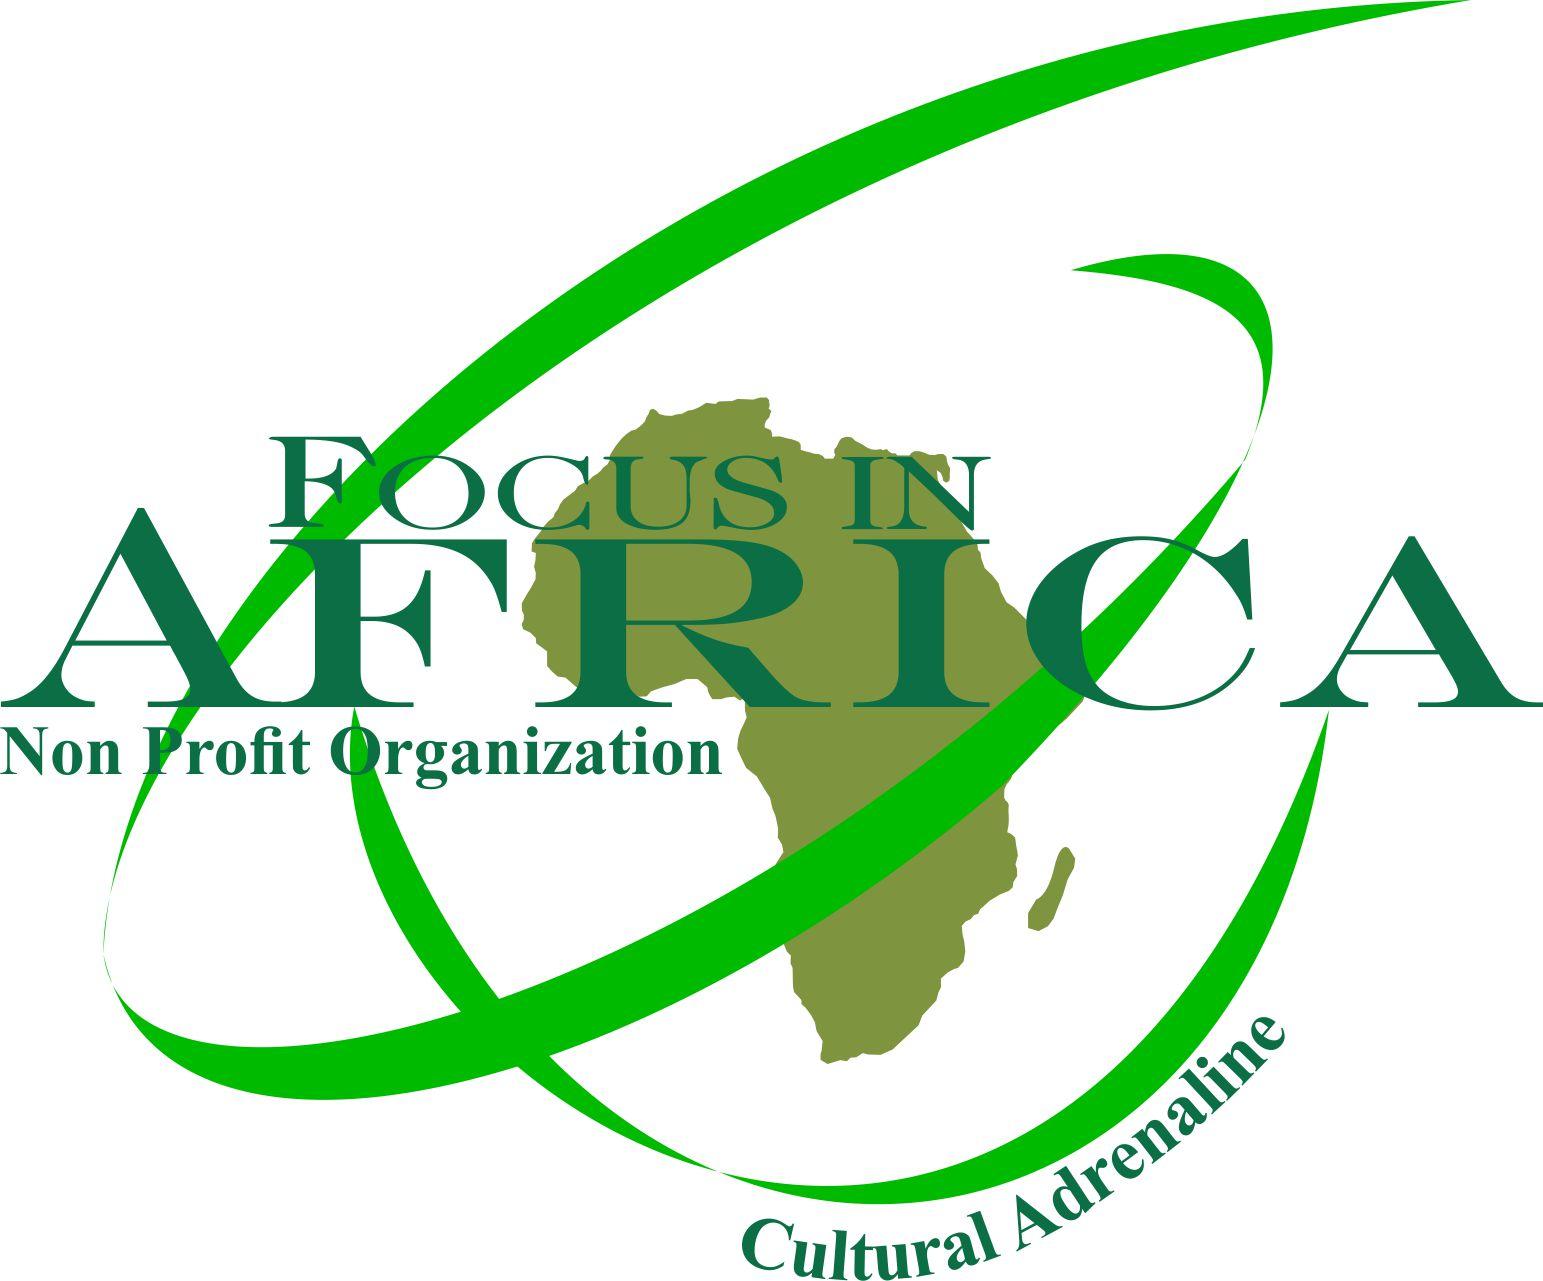 Focus in Africa: Medical/Healthcare Internship in Tanzania